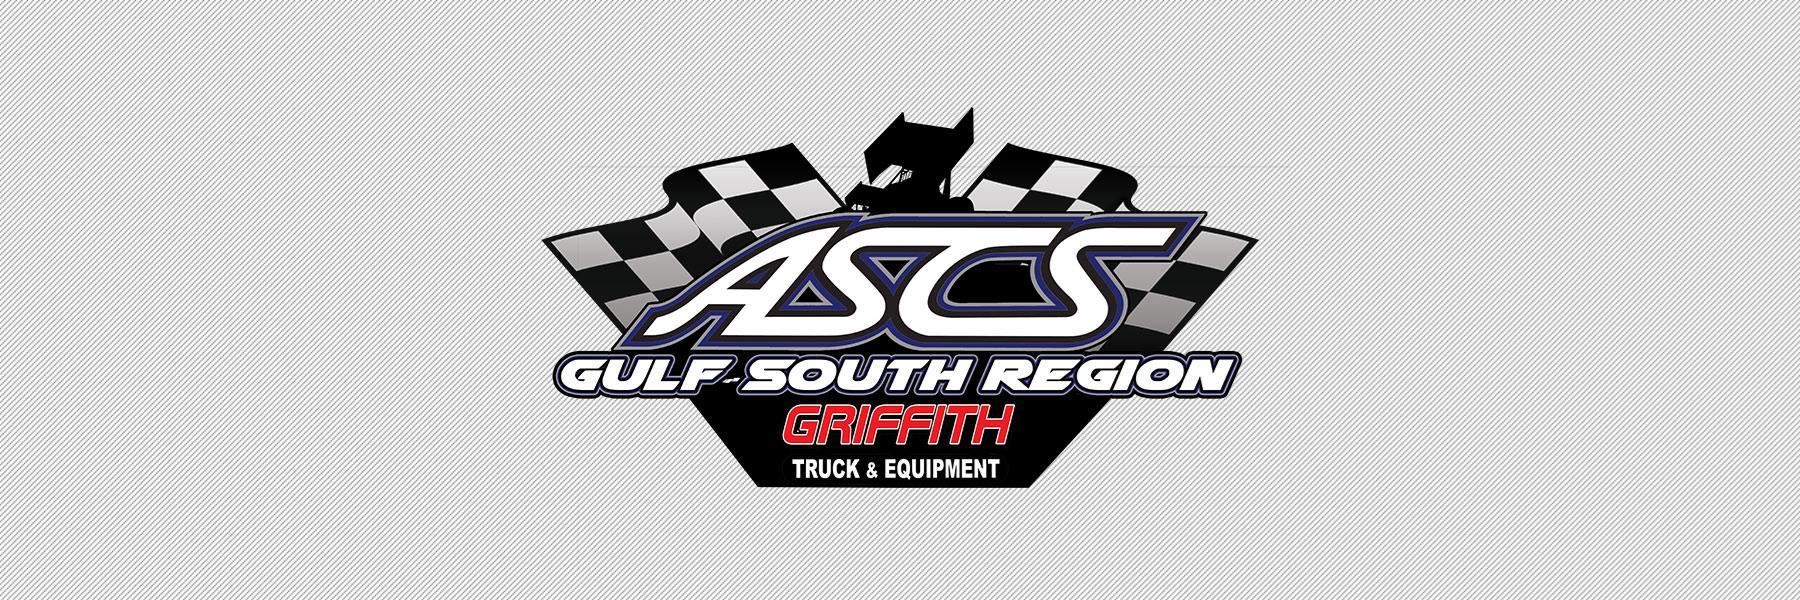 ASCS Gulf South Region